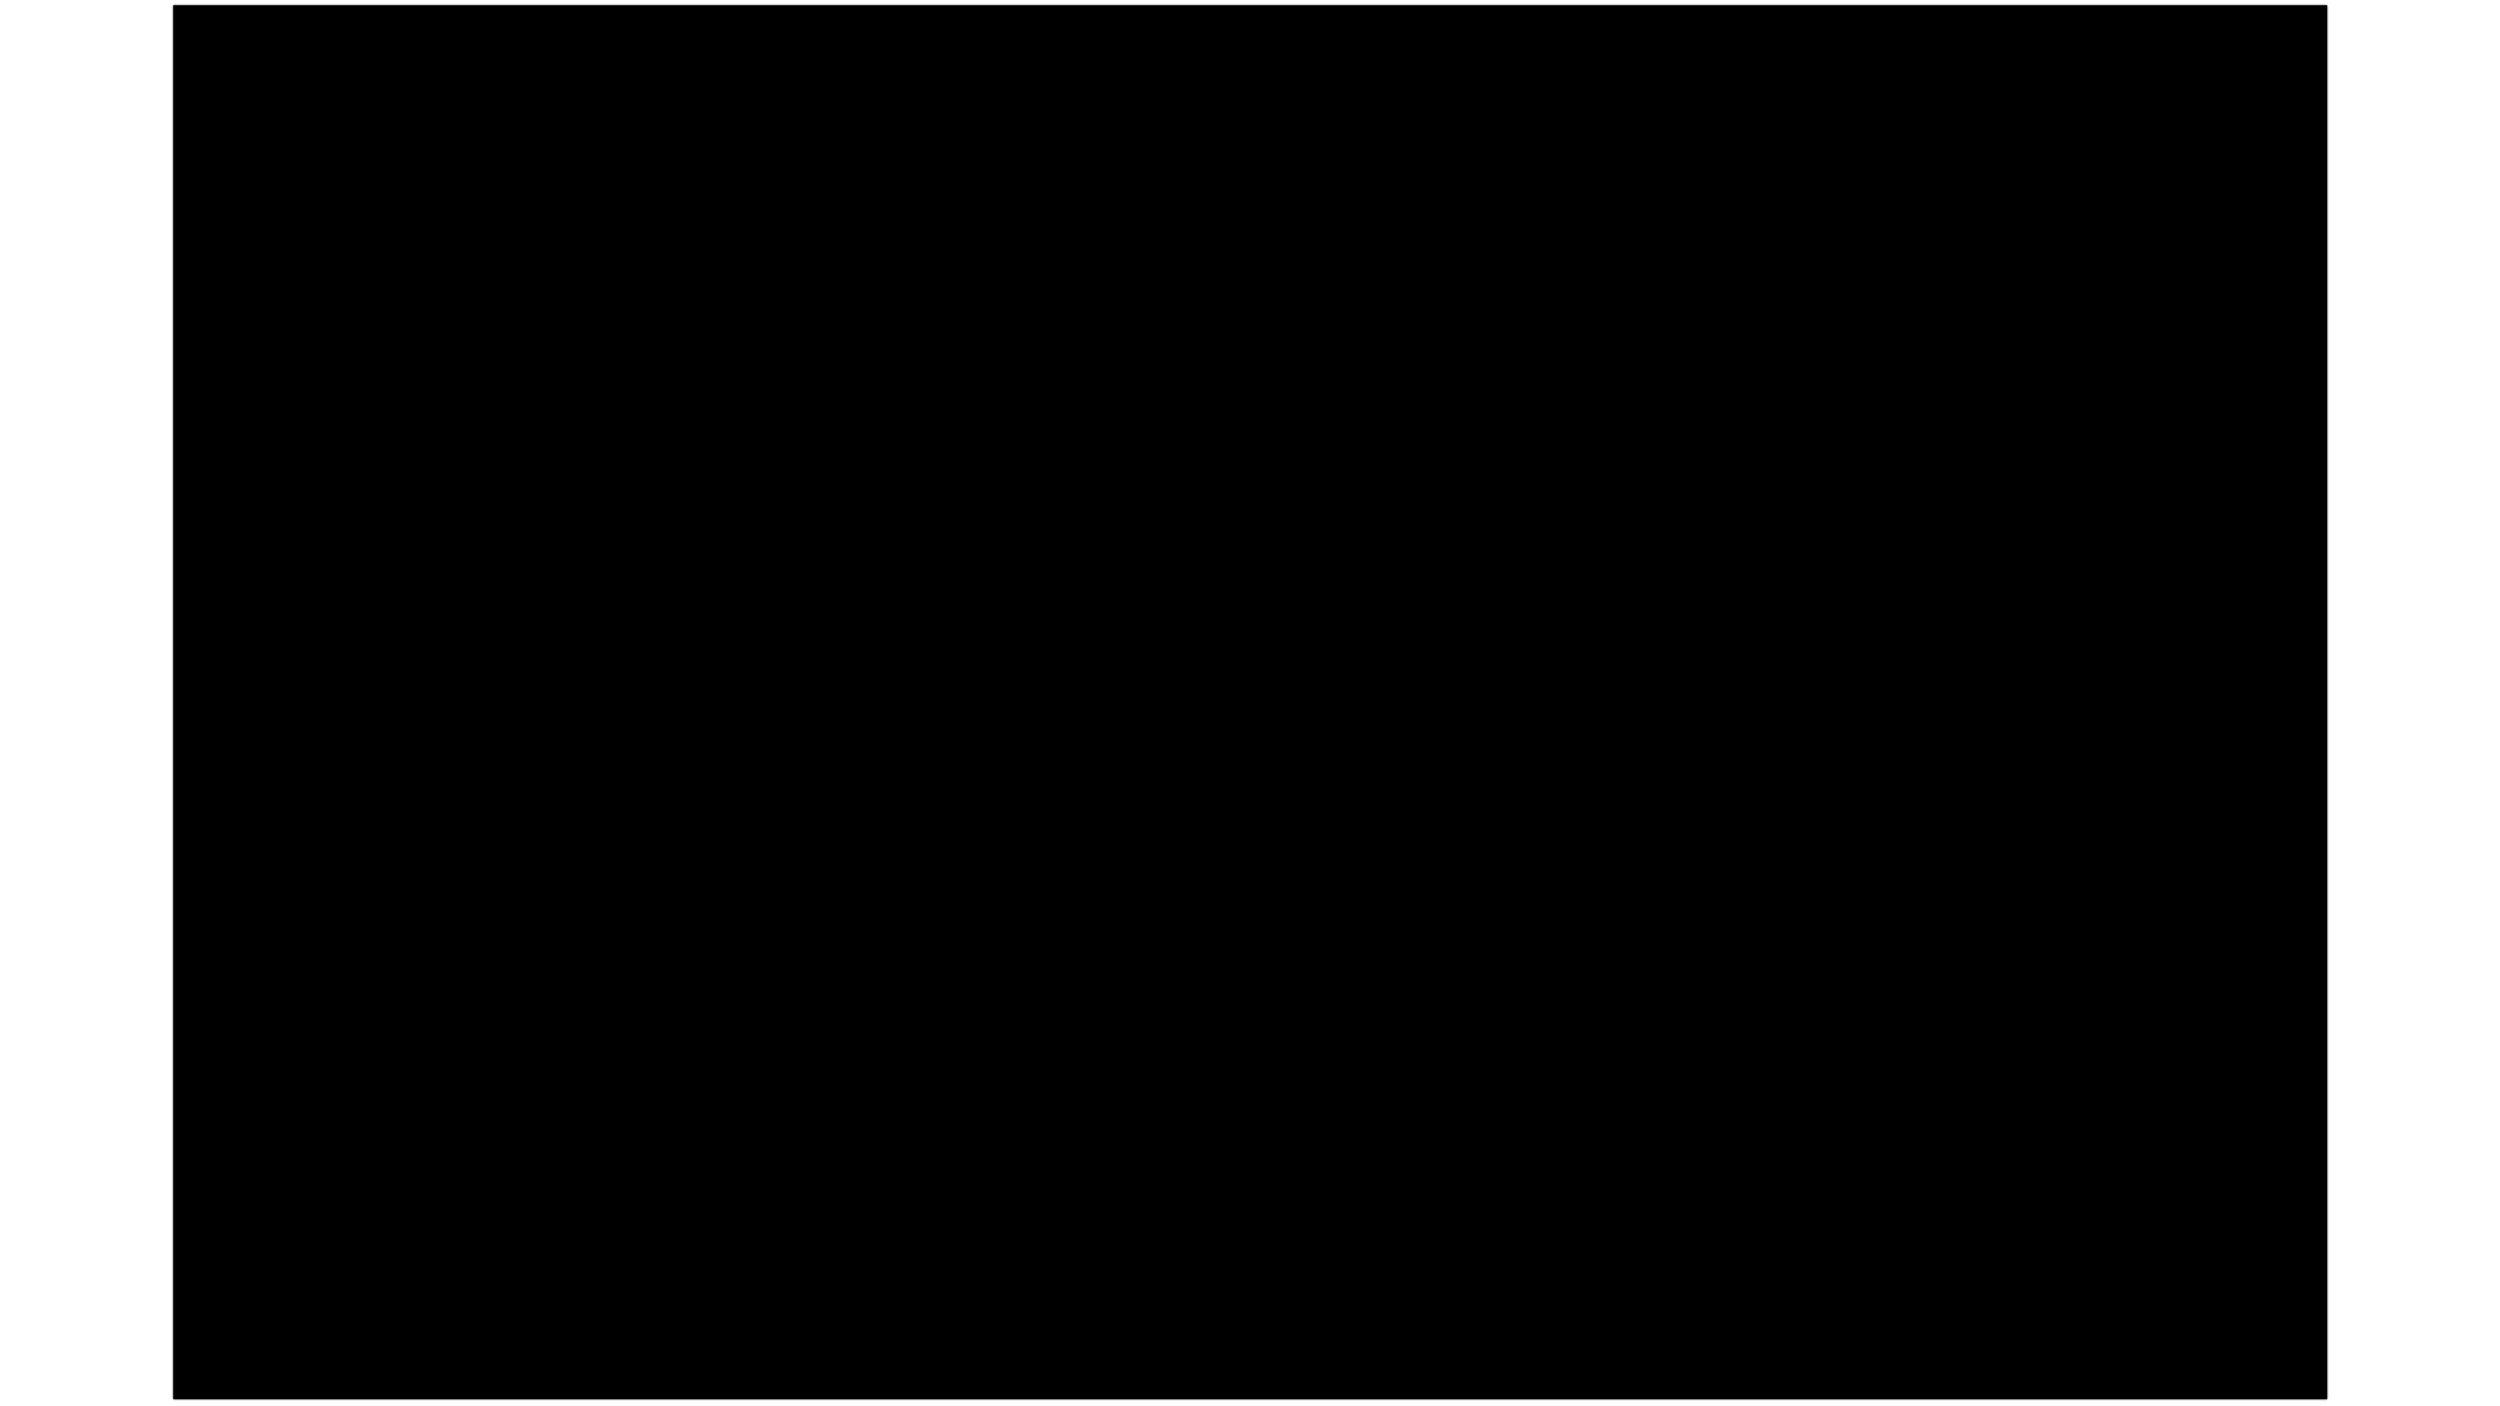 GD14.jpg